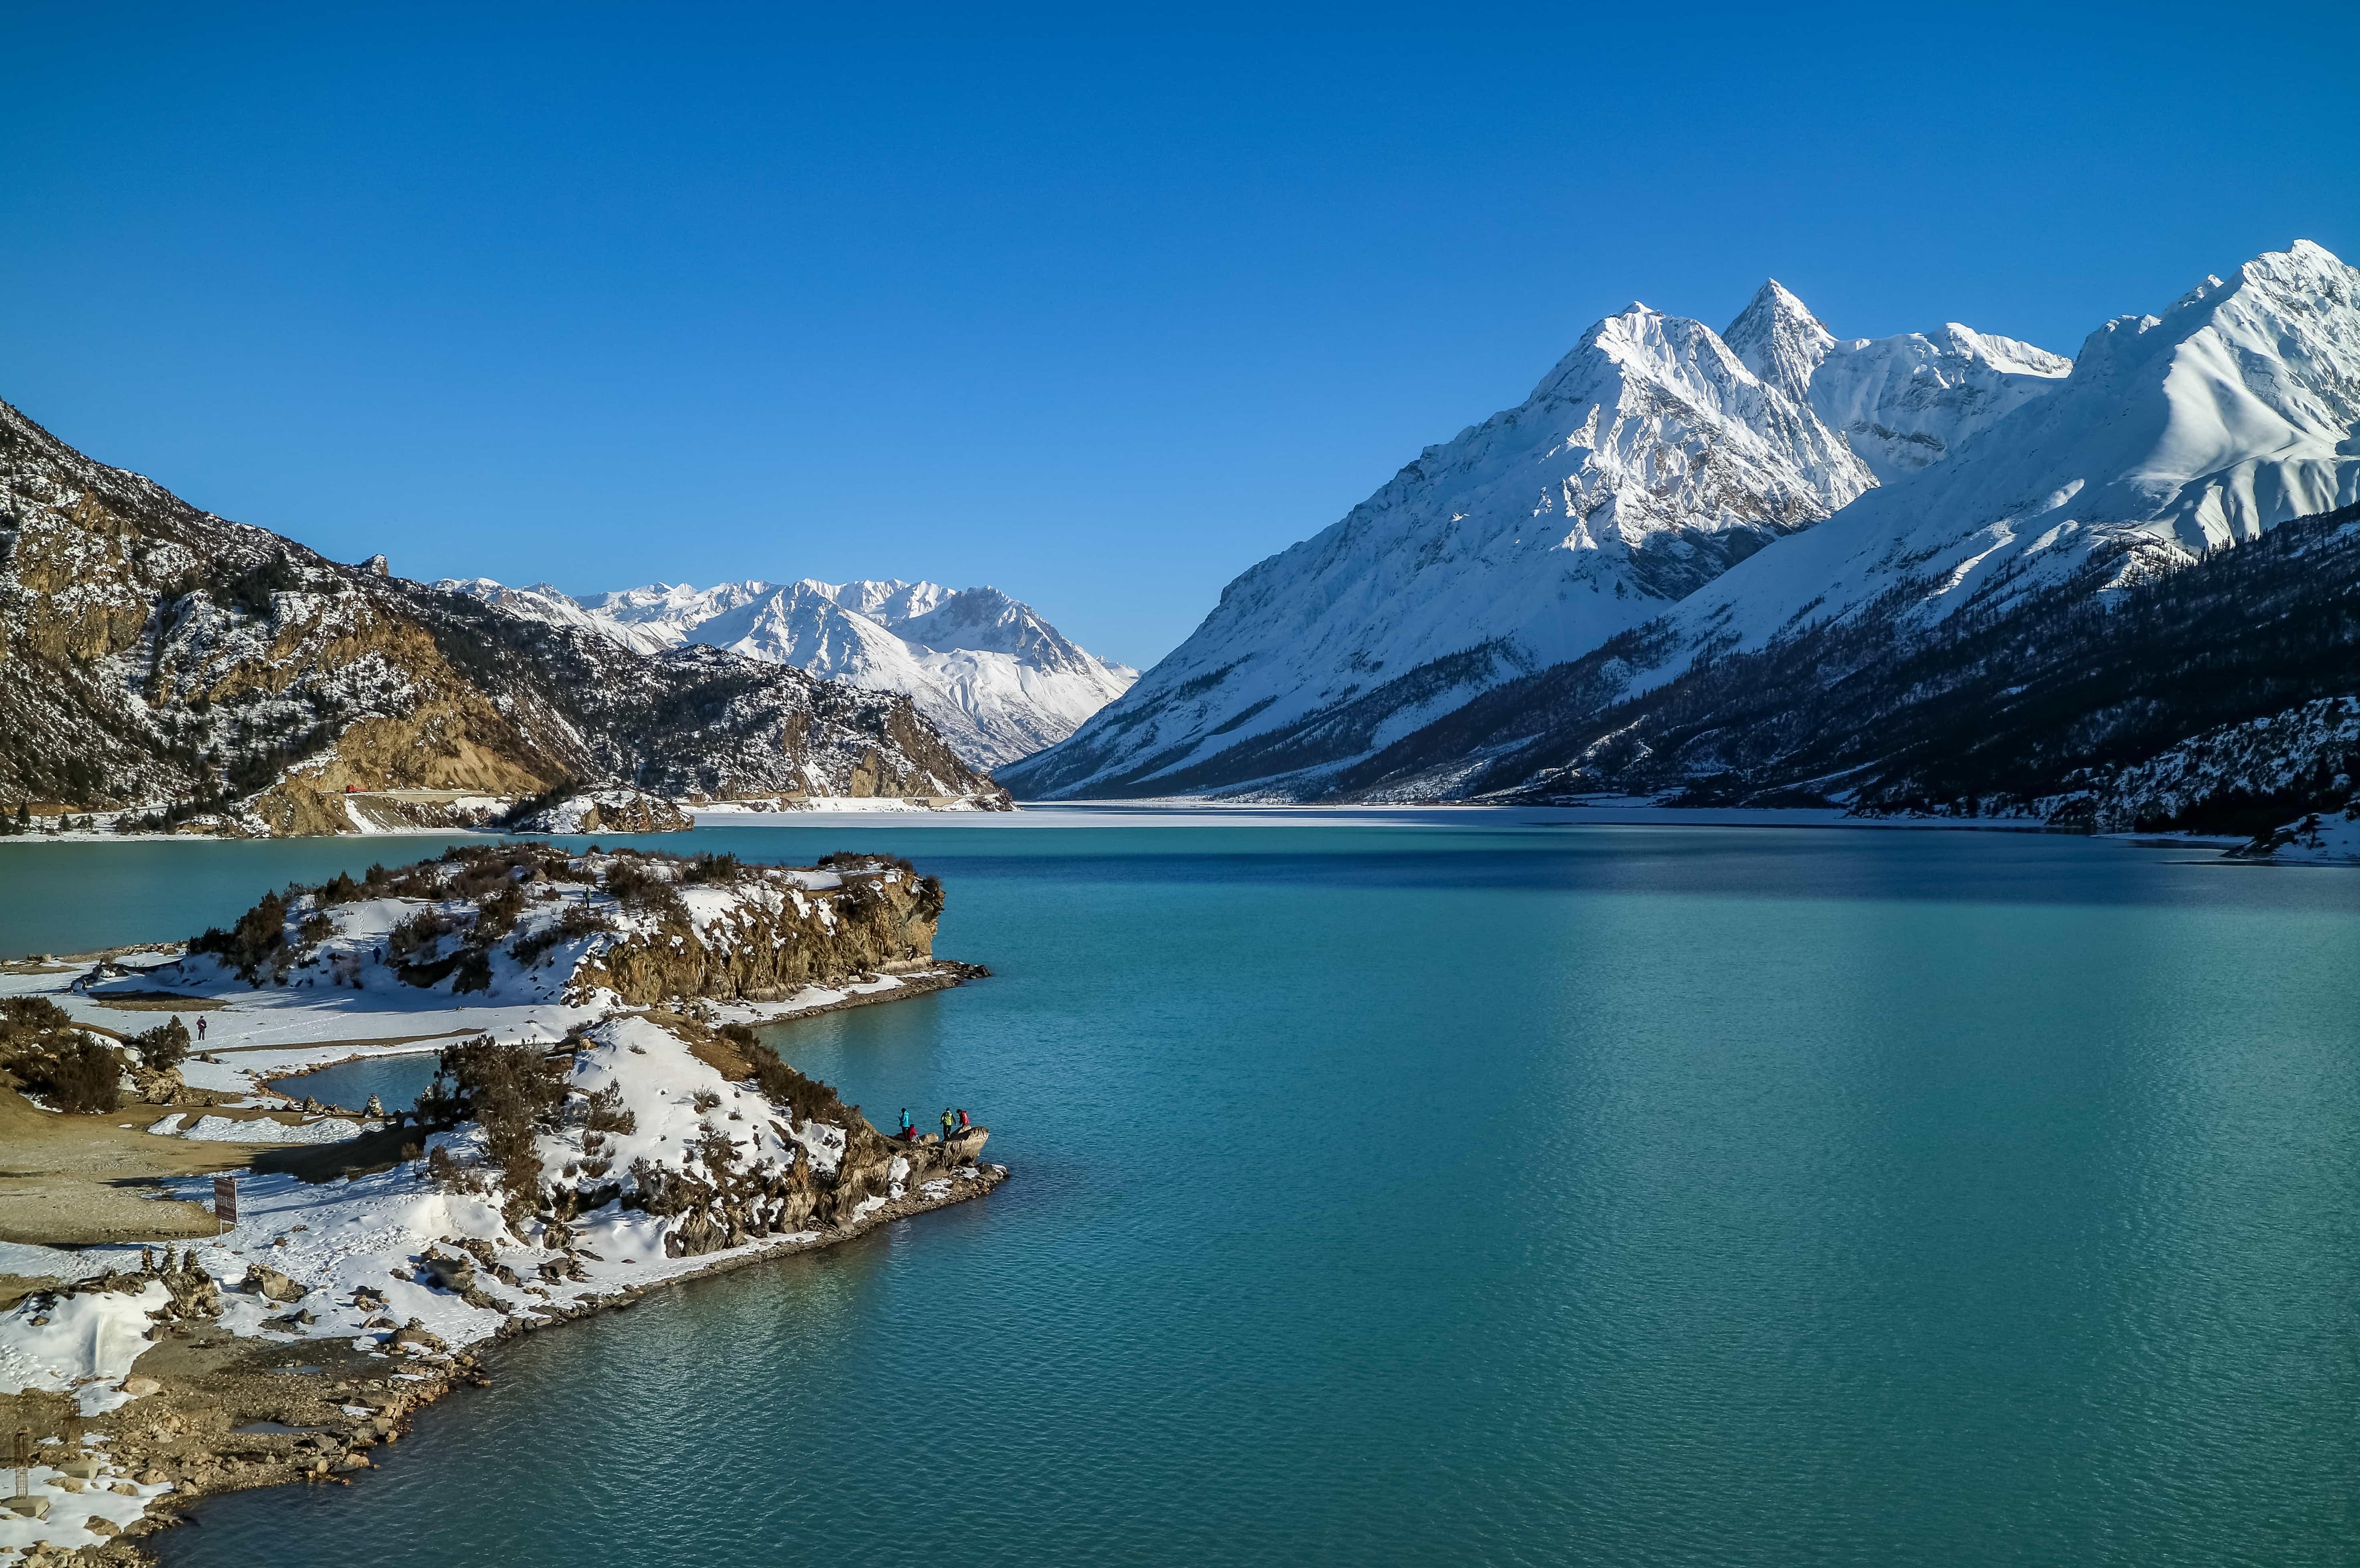 Ranwu lake in Nyingchi, Eastern Tibet